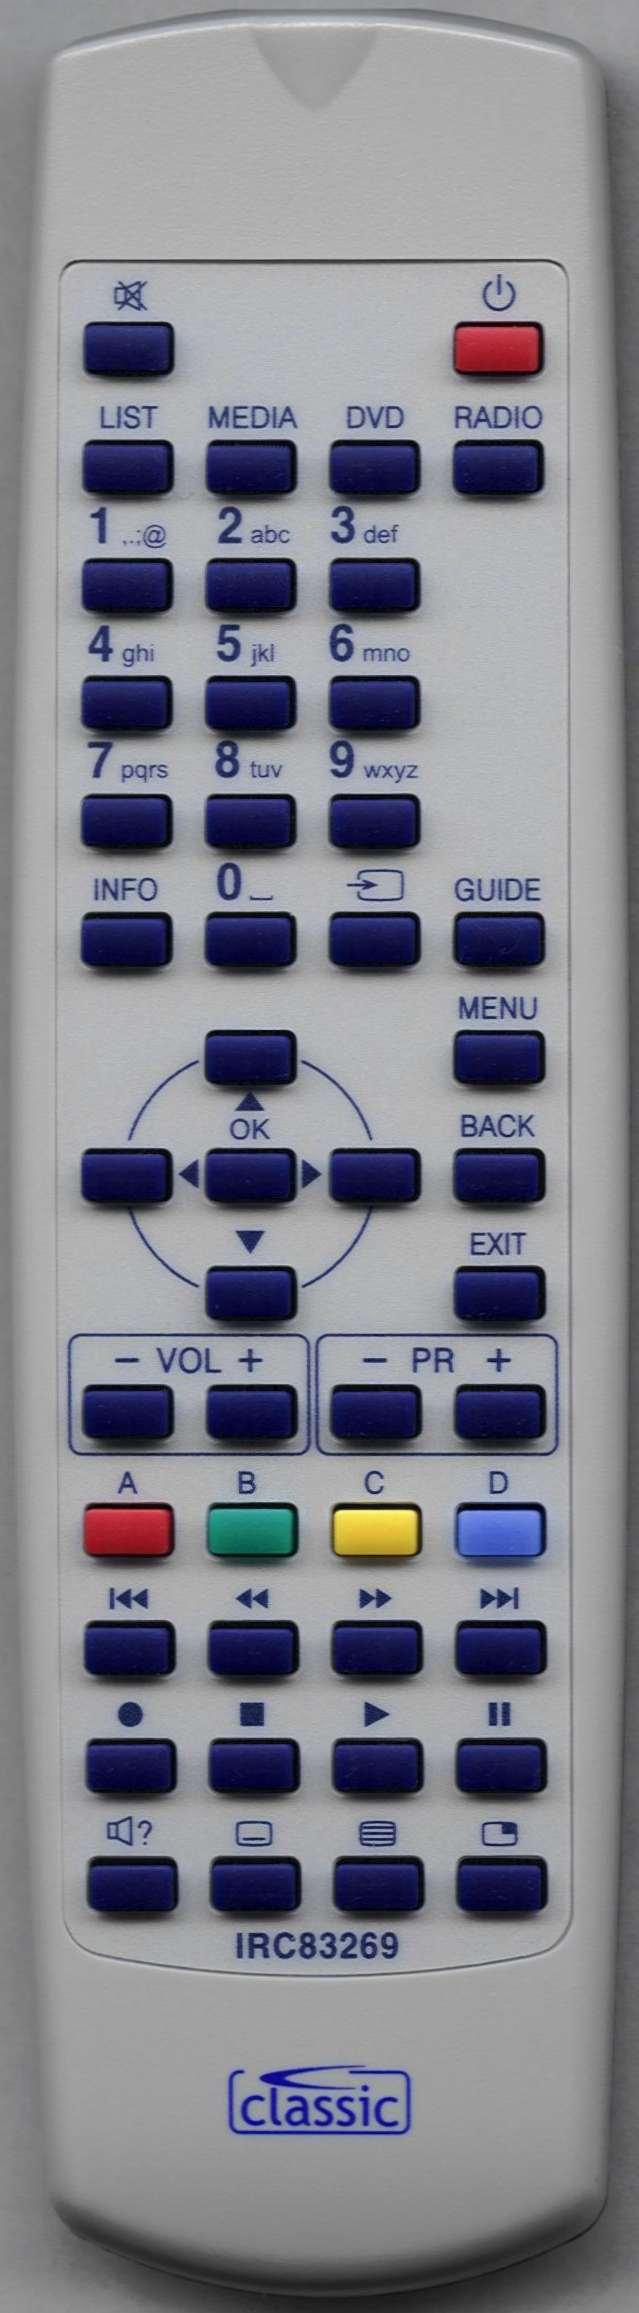 SAGEMCOM DTR94320SHD Replacement Remote Control